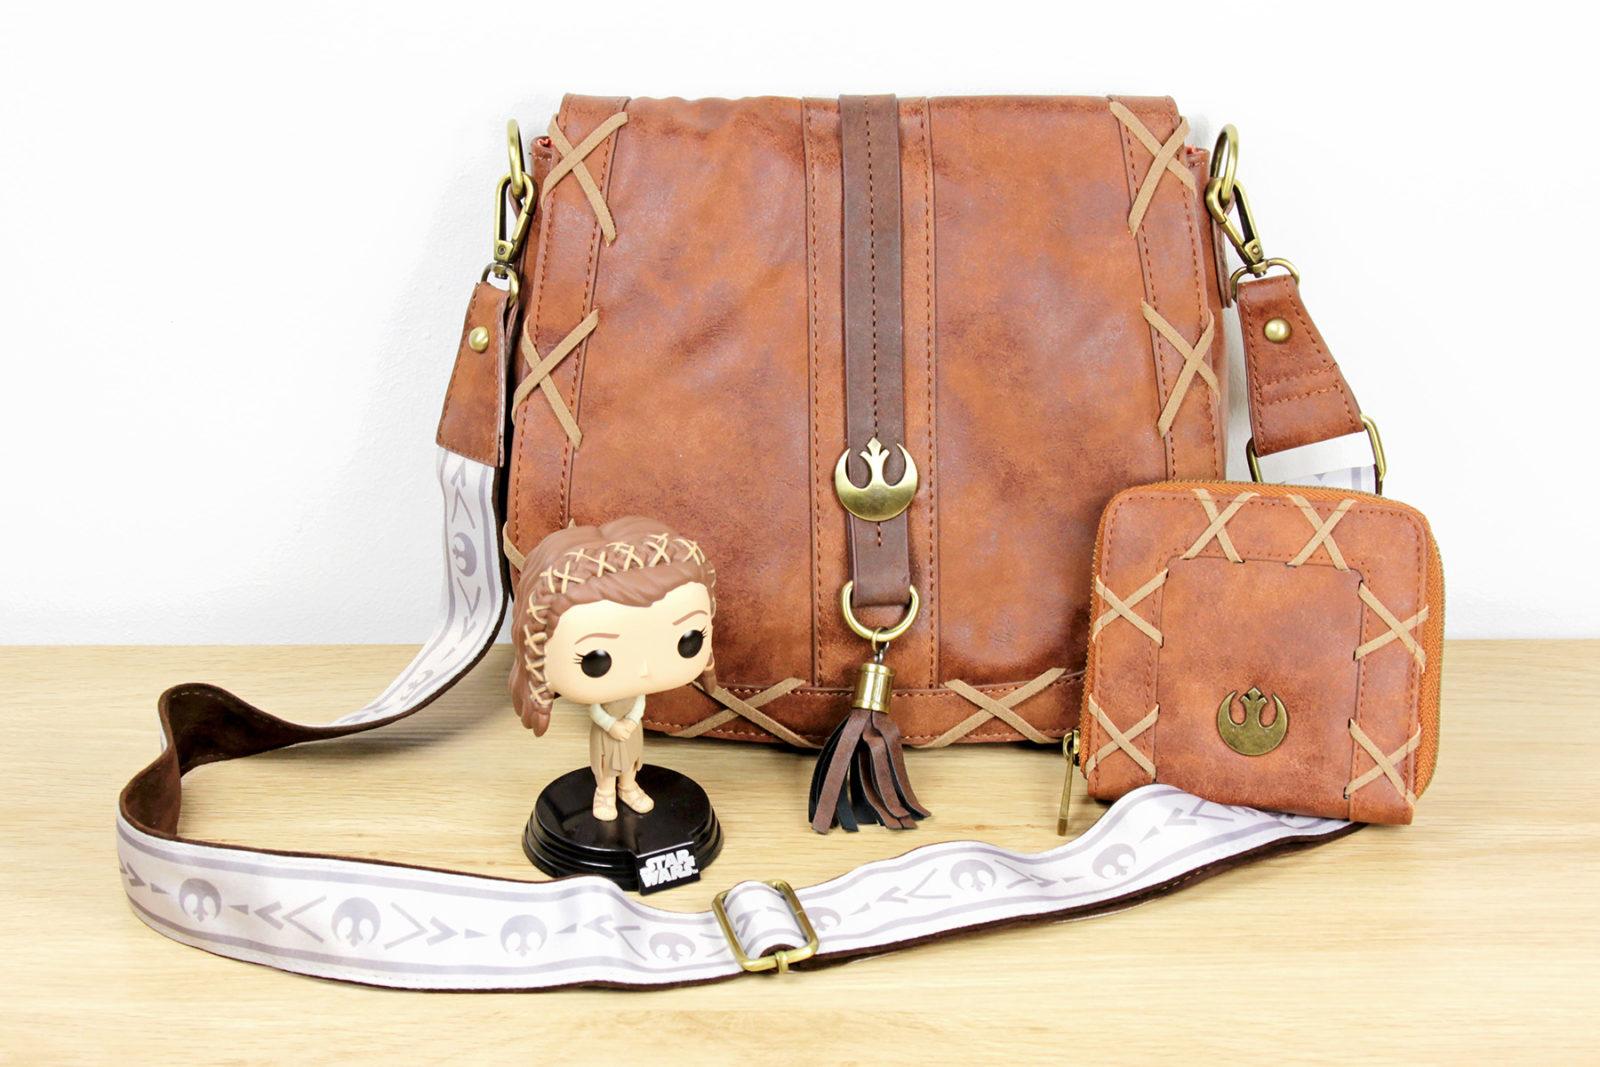 Heroes & Villians x Star Wars Princess Leia Bag and Wallet